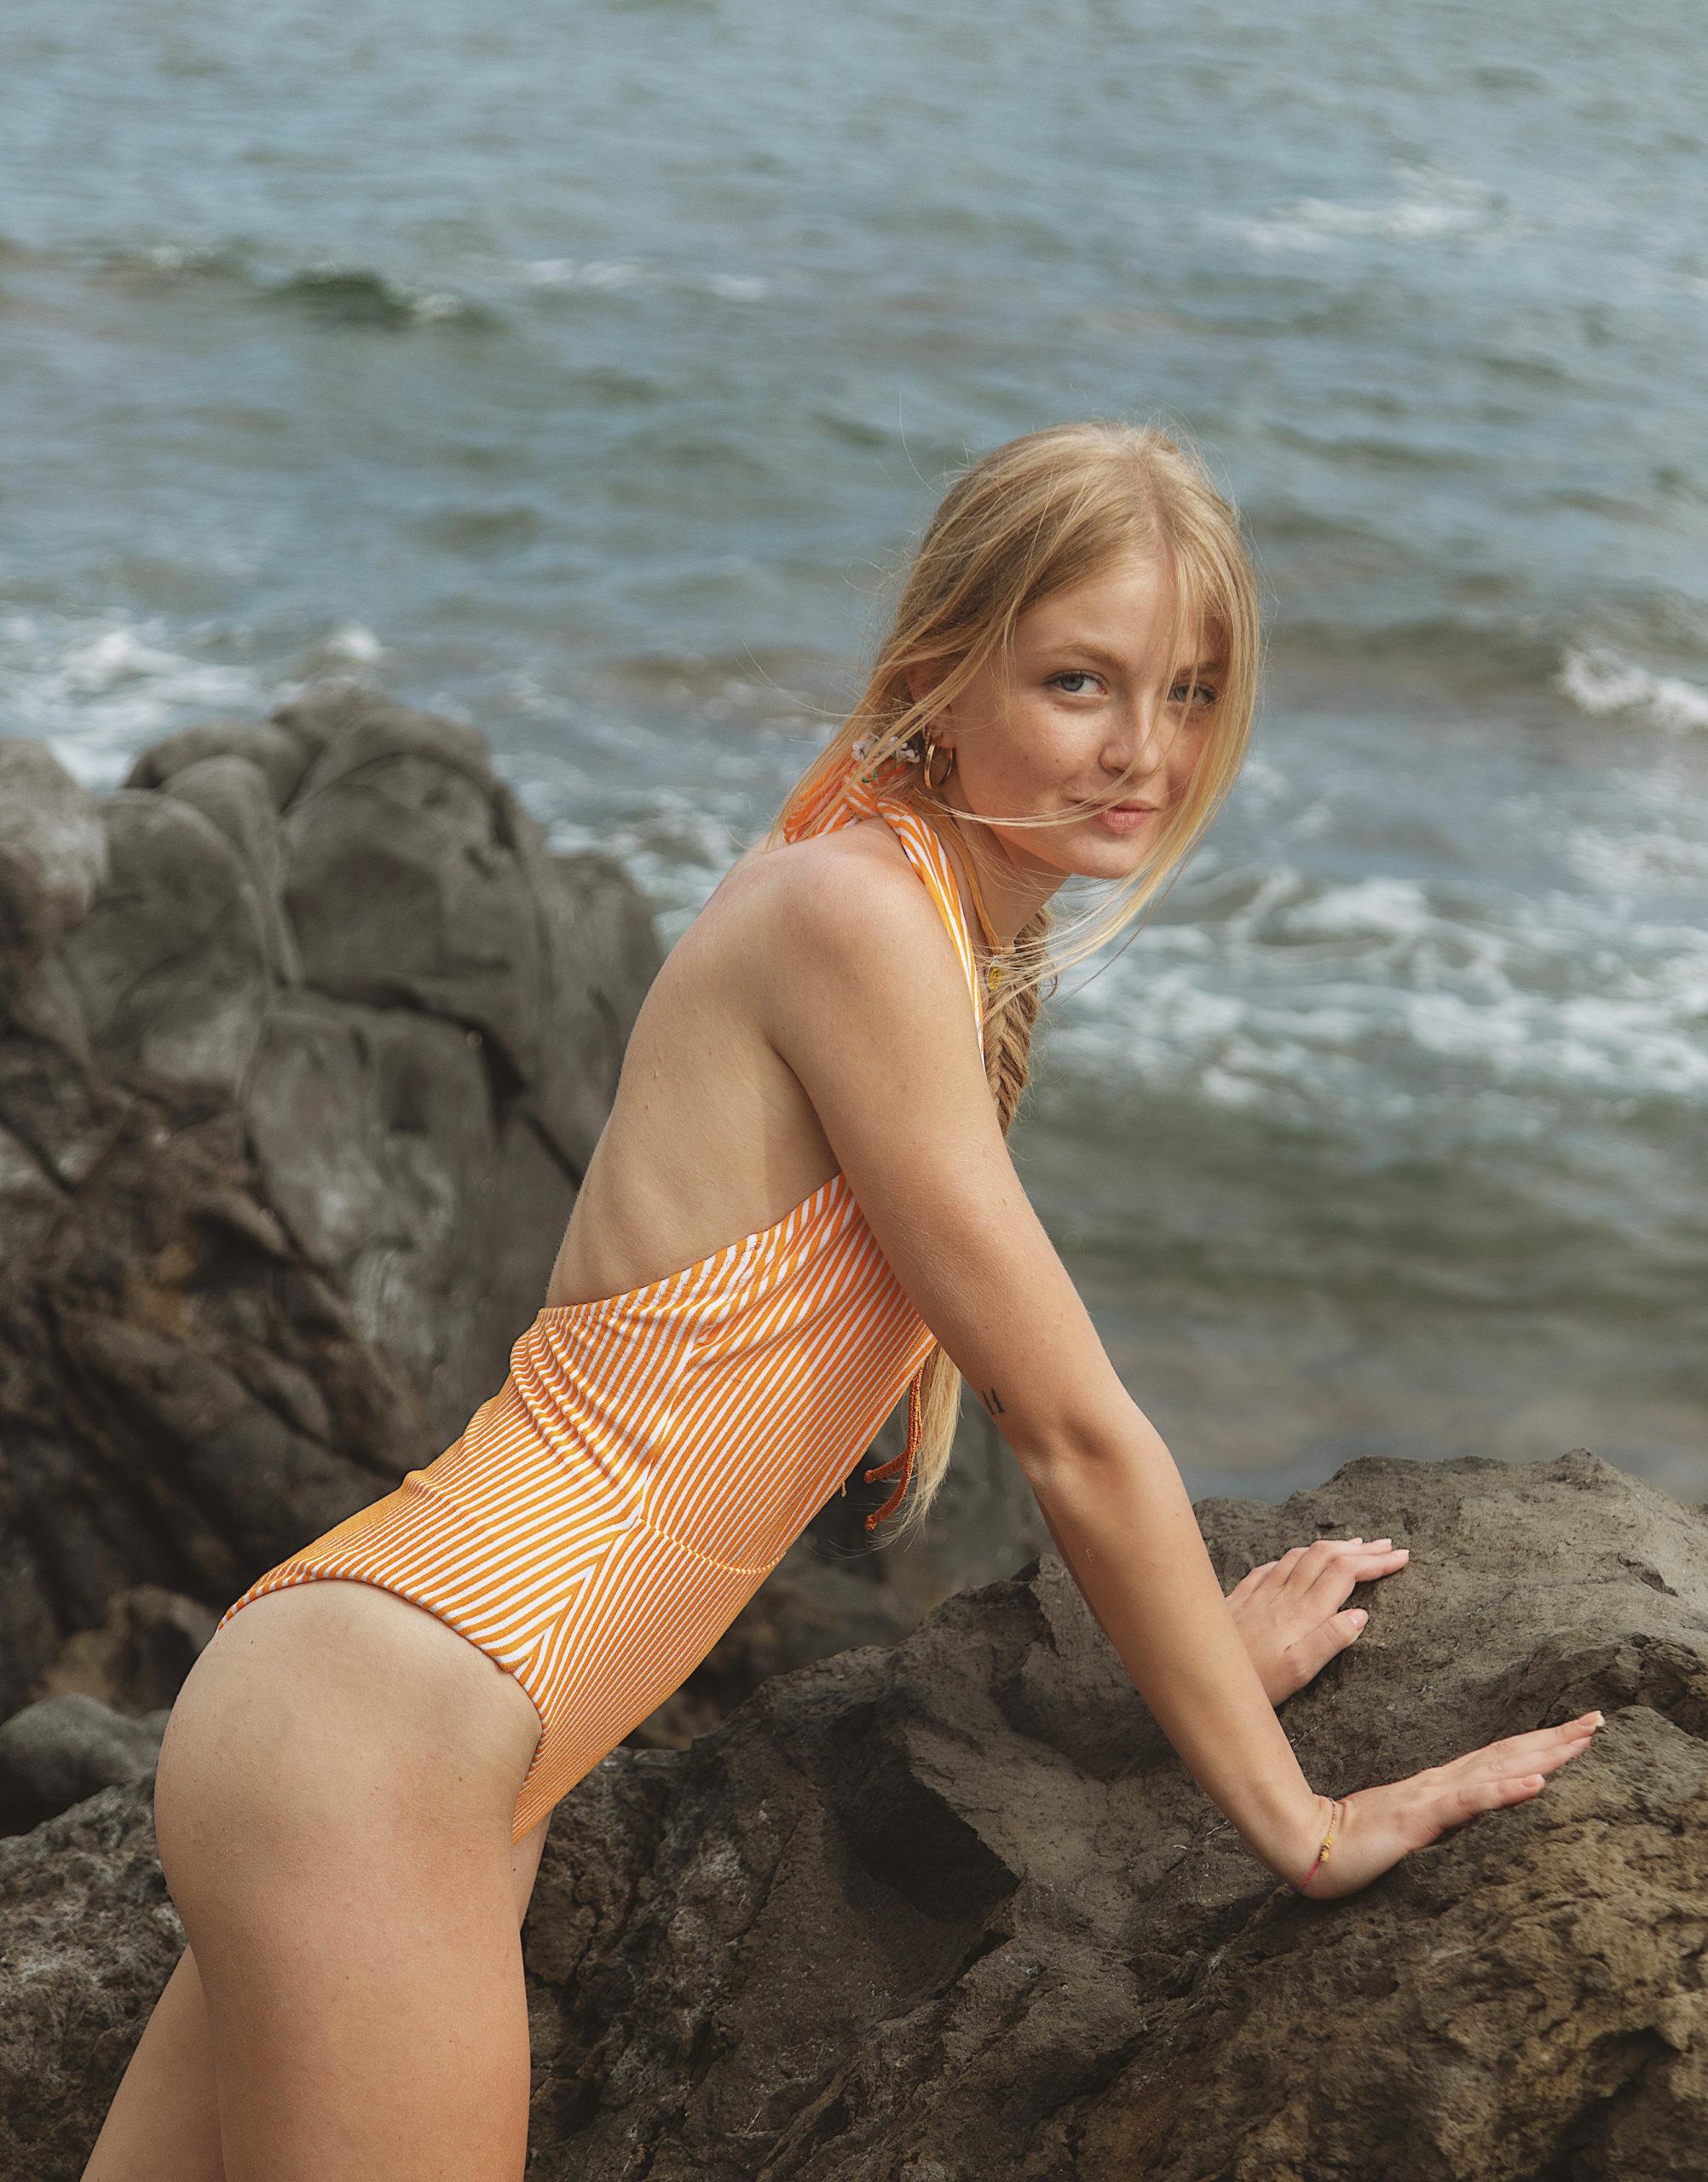 Stripes&shine Spongy Maillot in Orange